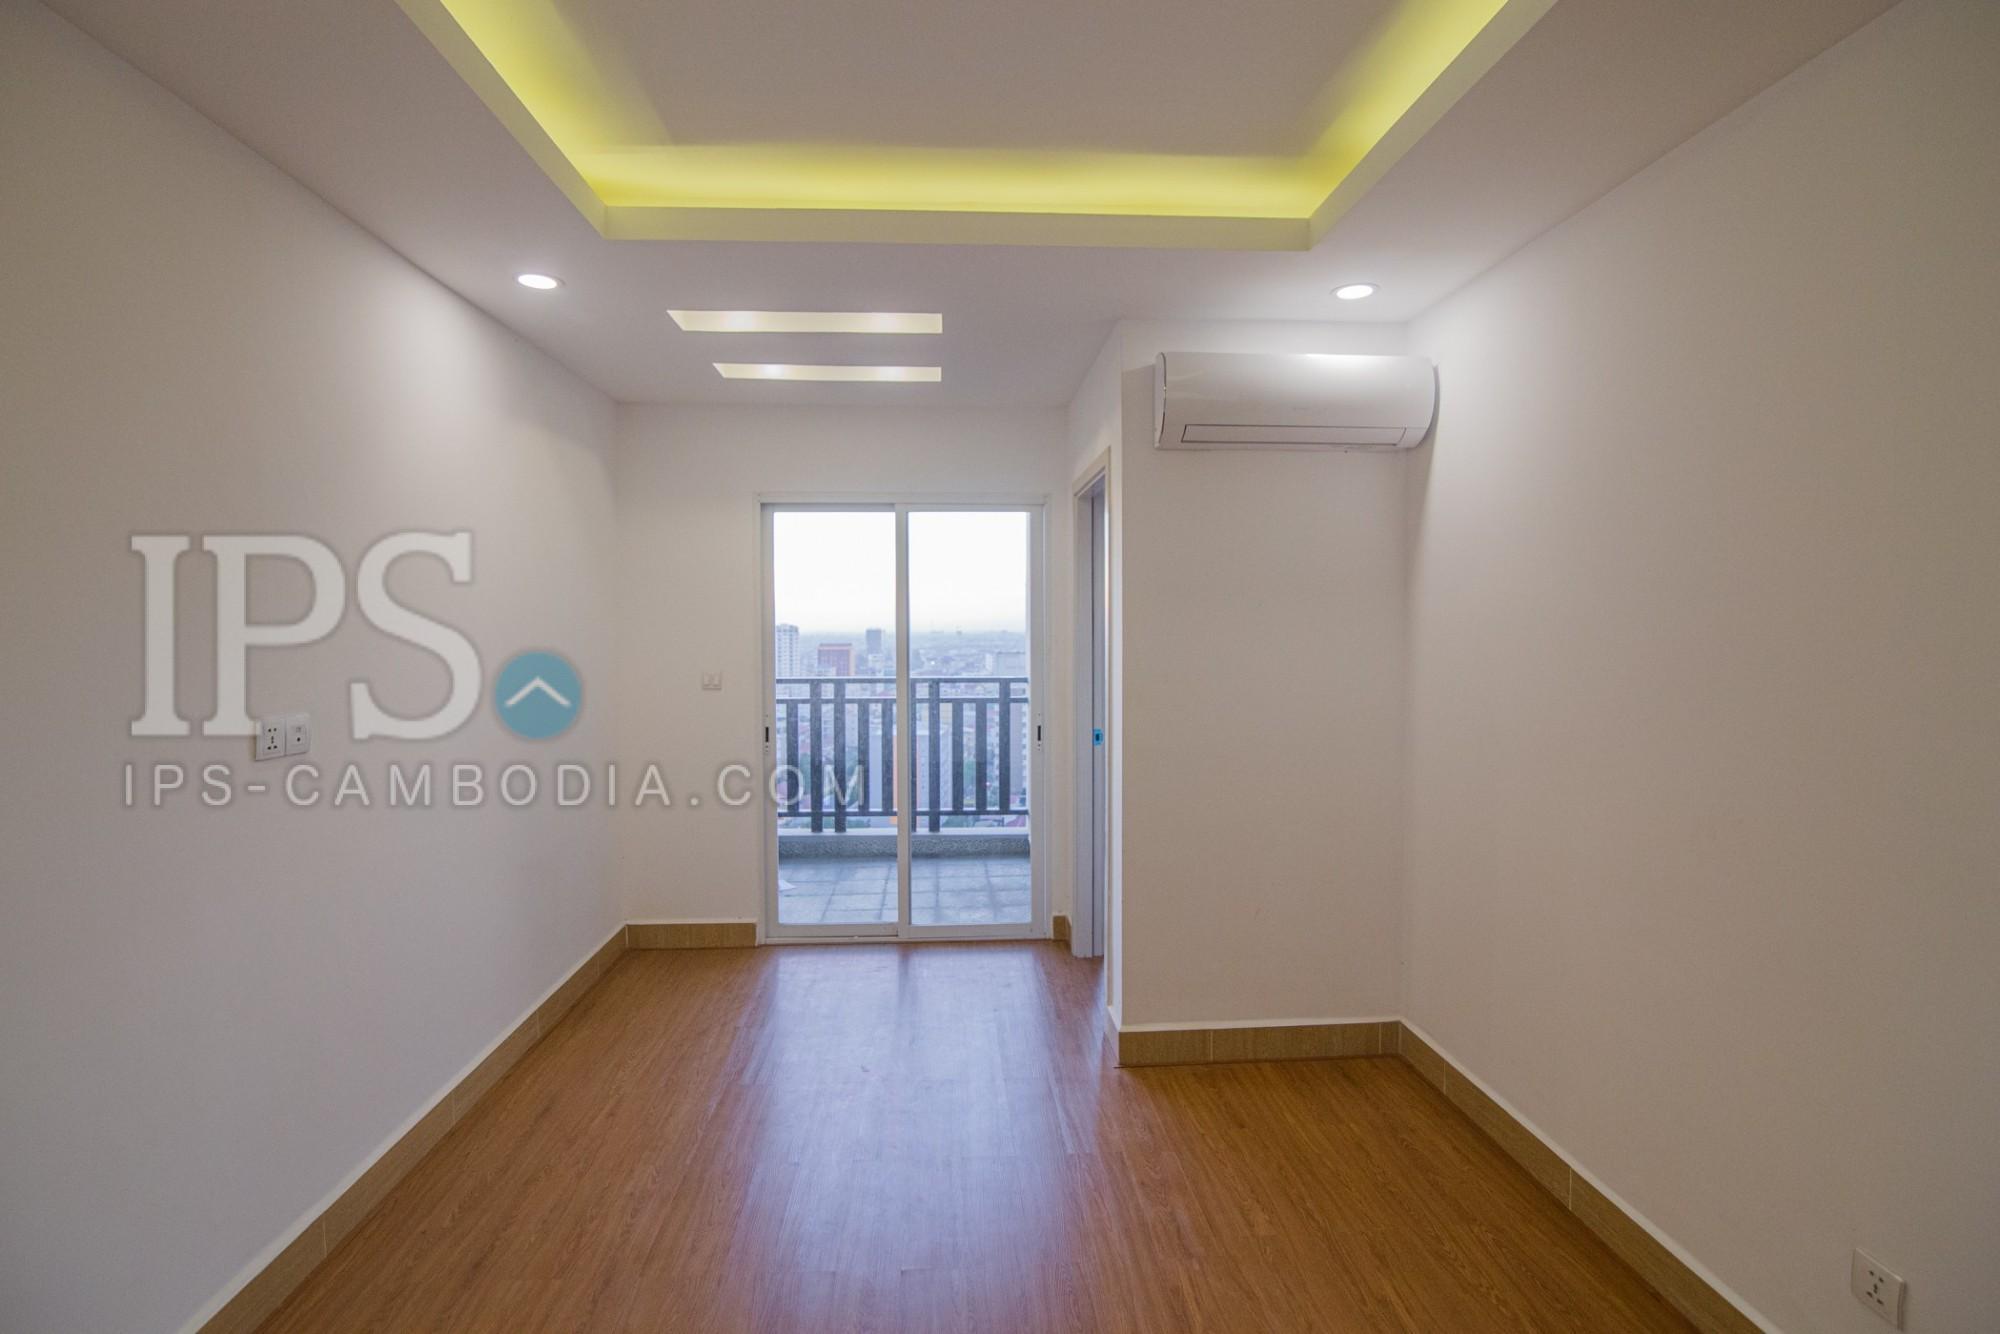 1 Bedroom Condo For Sale - Boeung Trabek, Chamkarmorn, Phnom Penh